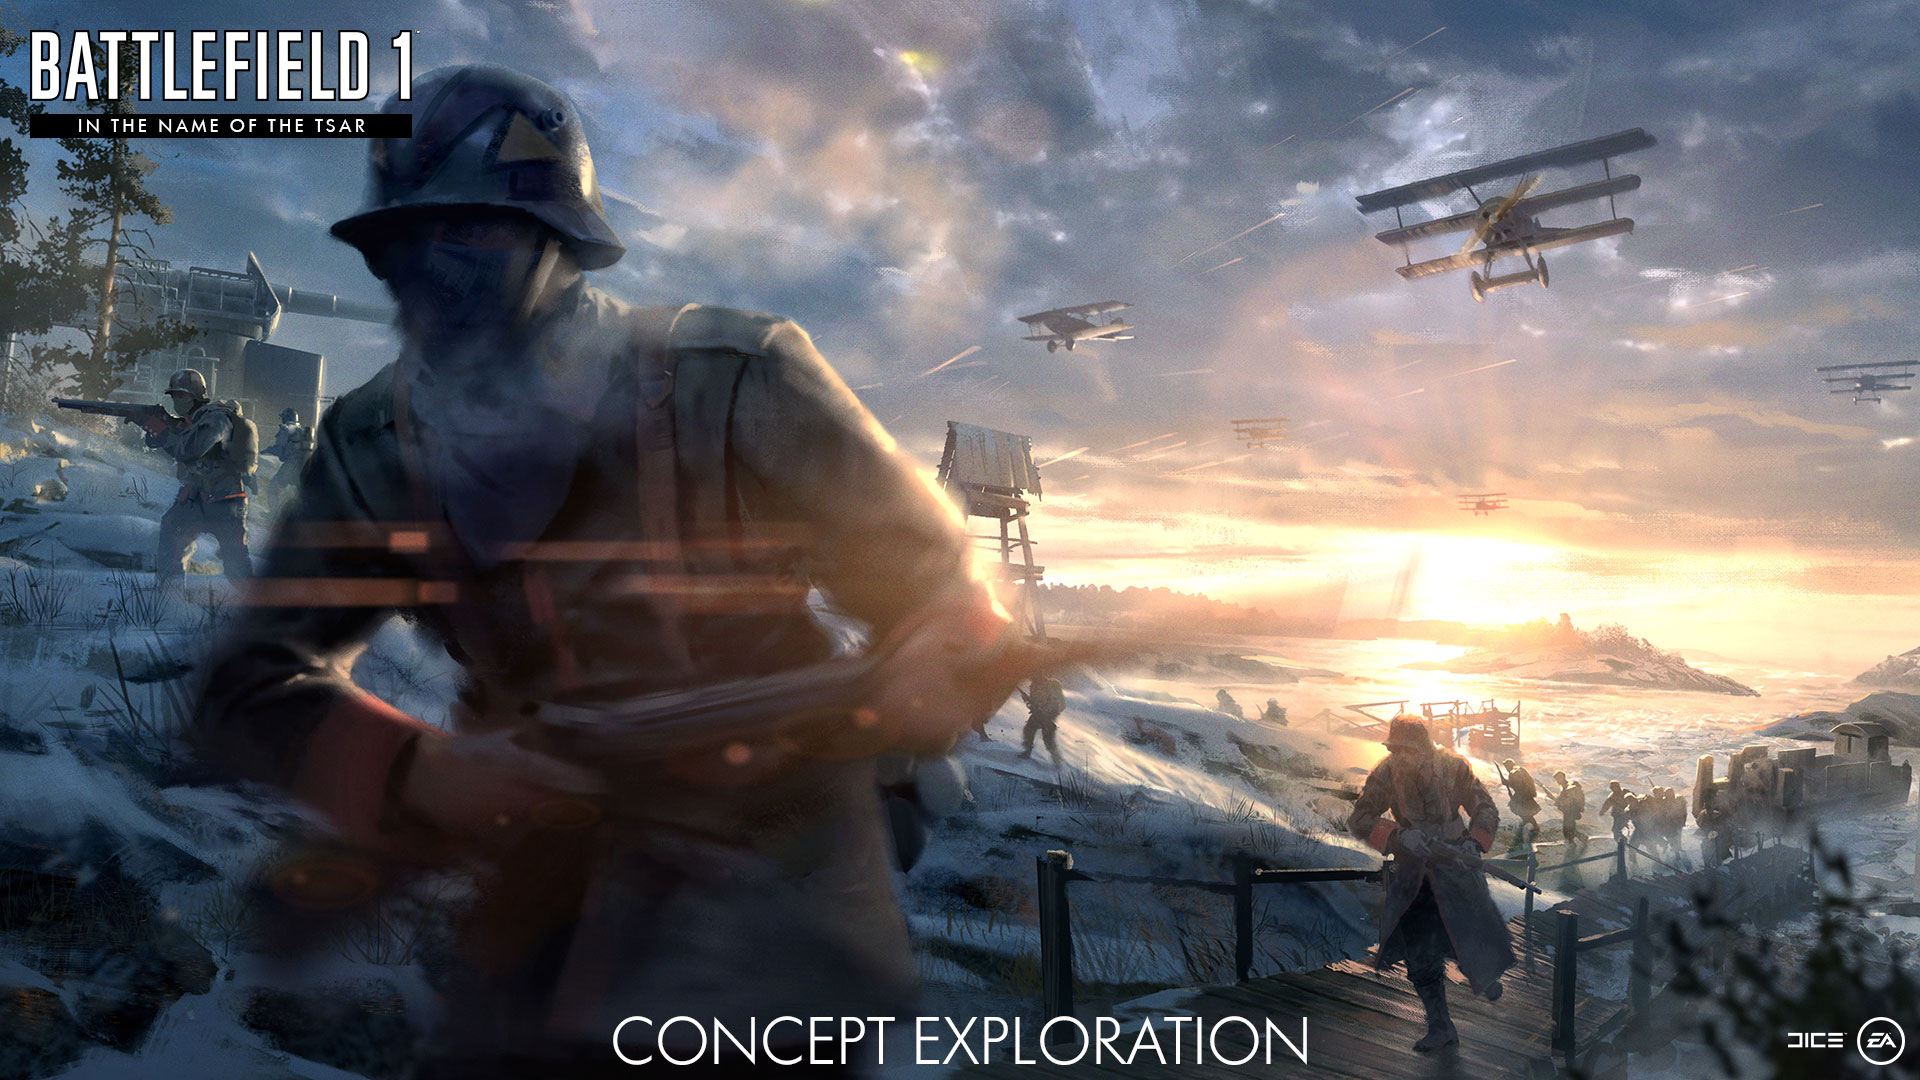 https://media-www-battlefieldwebcore.spark.ea.com/content/battlefield-portal/fr_FR/games/battlefield-1/in-the-name-of-the-tsar/_jcr_content/par/section_0/columns/column/content/editorial_0/image/large.img.jpg